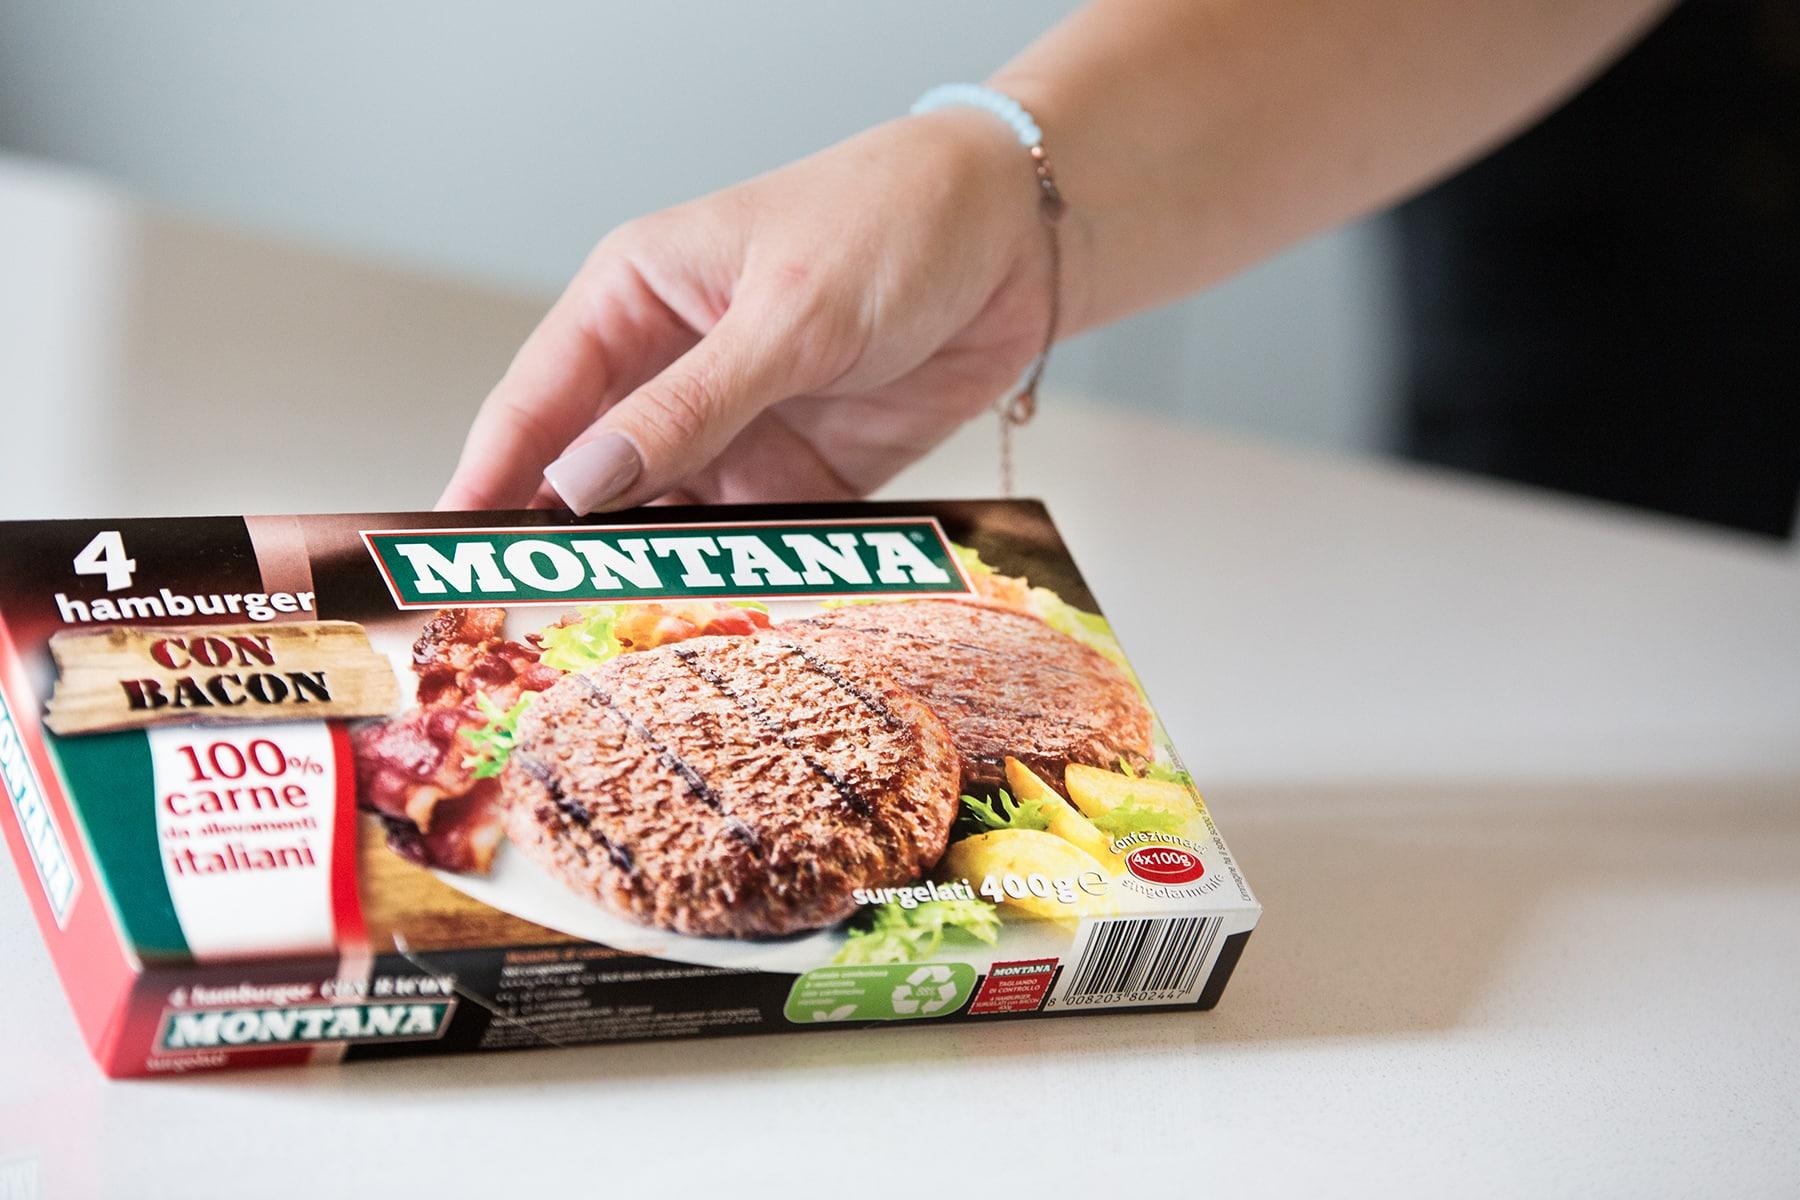 hamburger-montana-contemporaneo-food